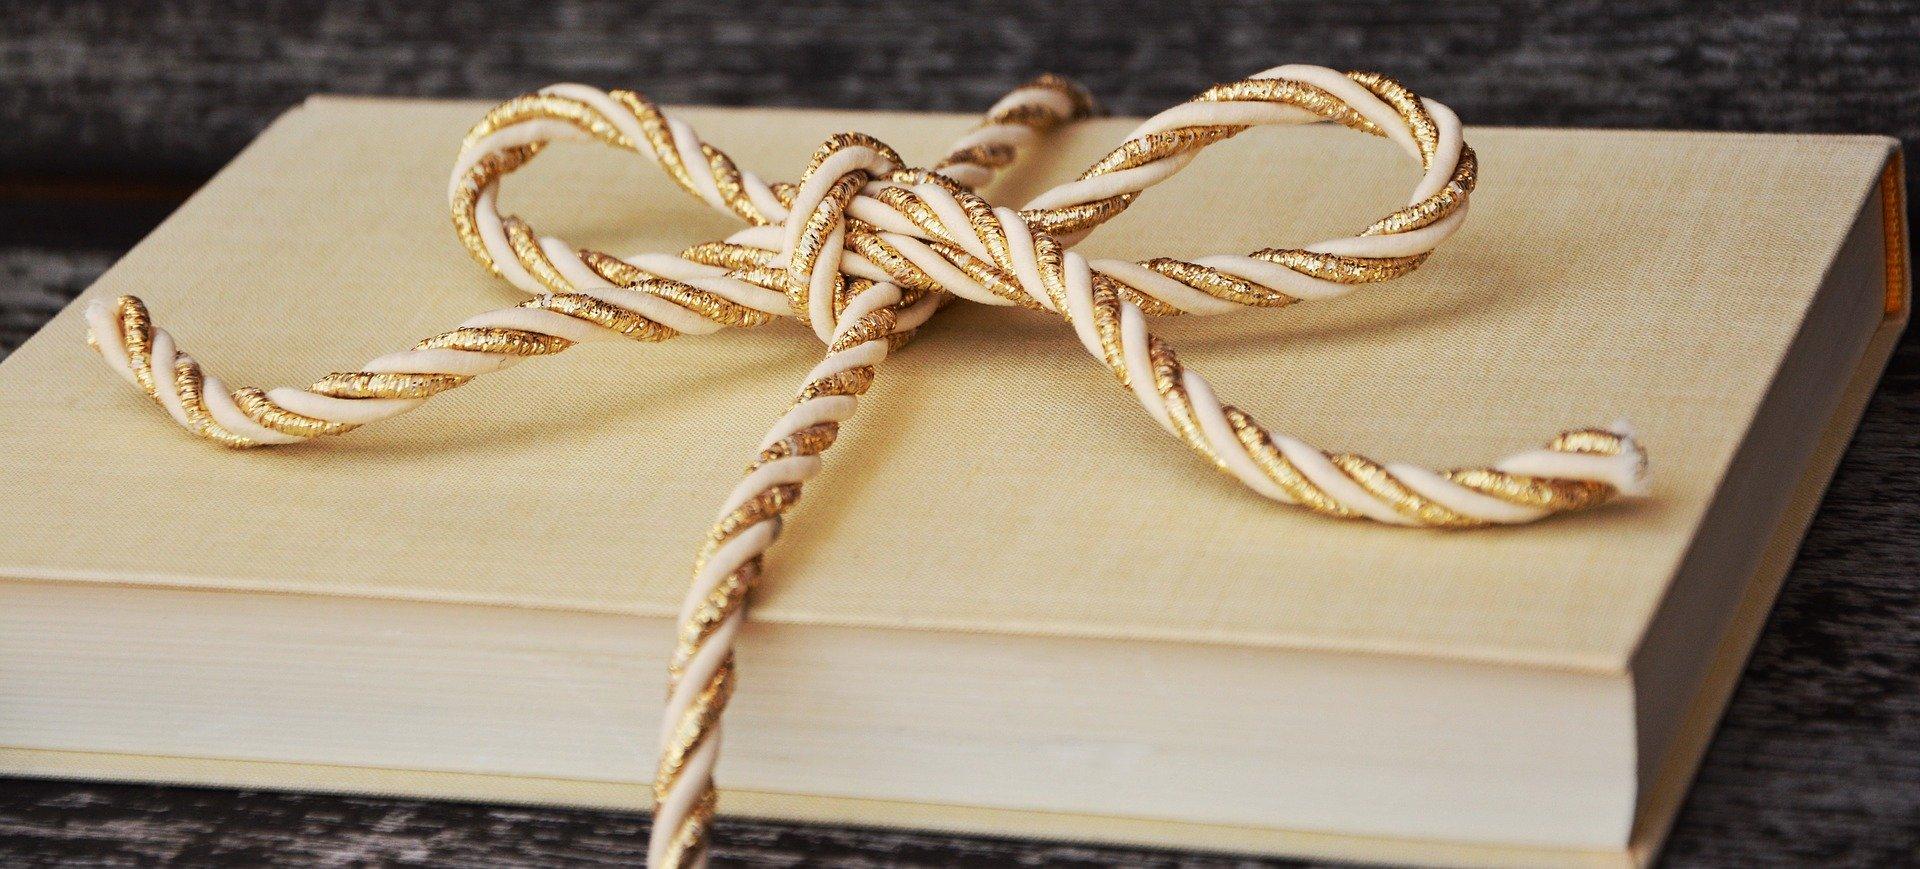 Book Lists for Christmas